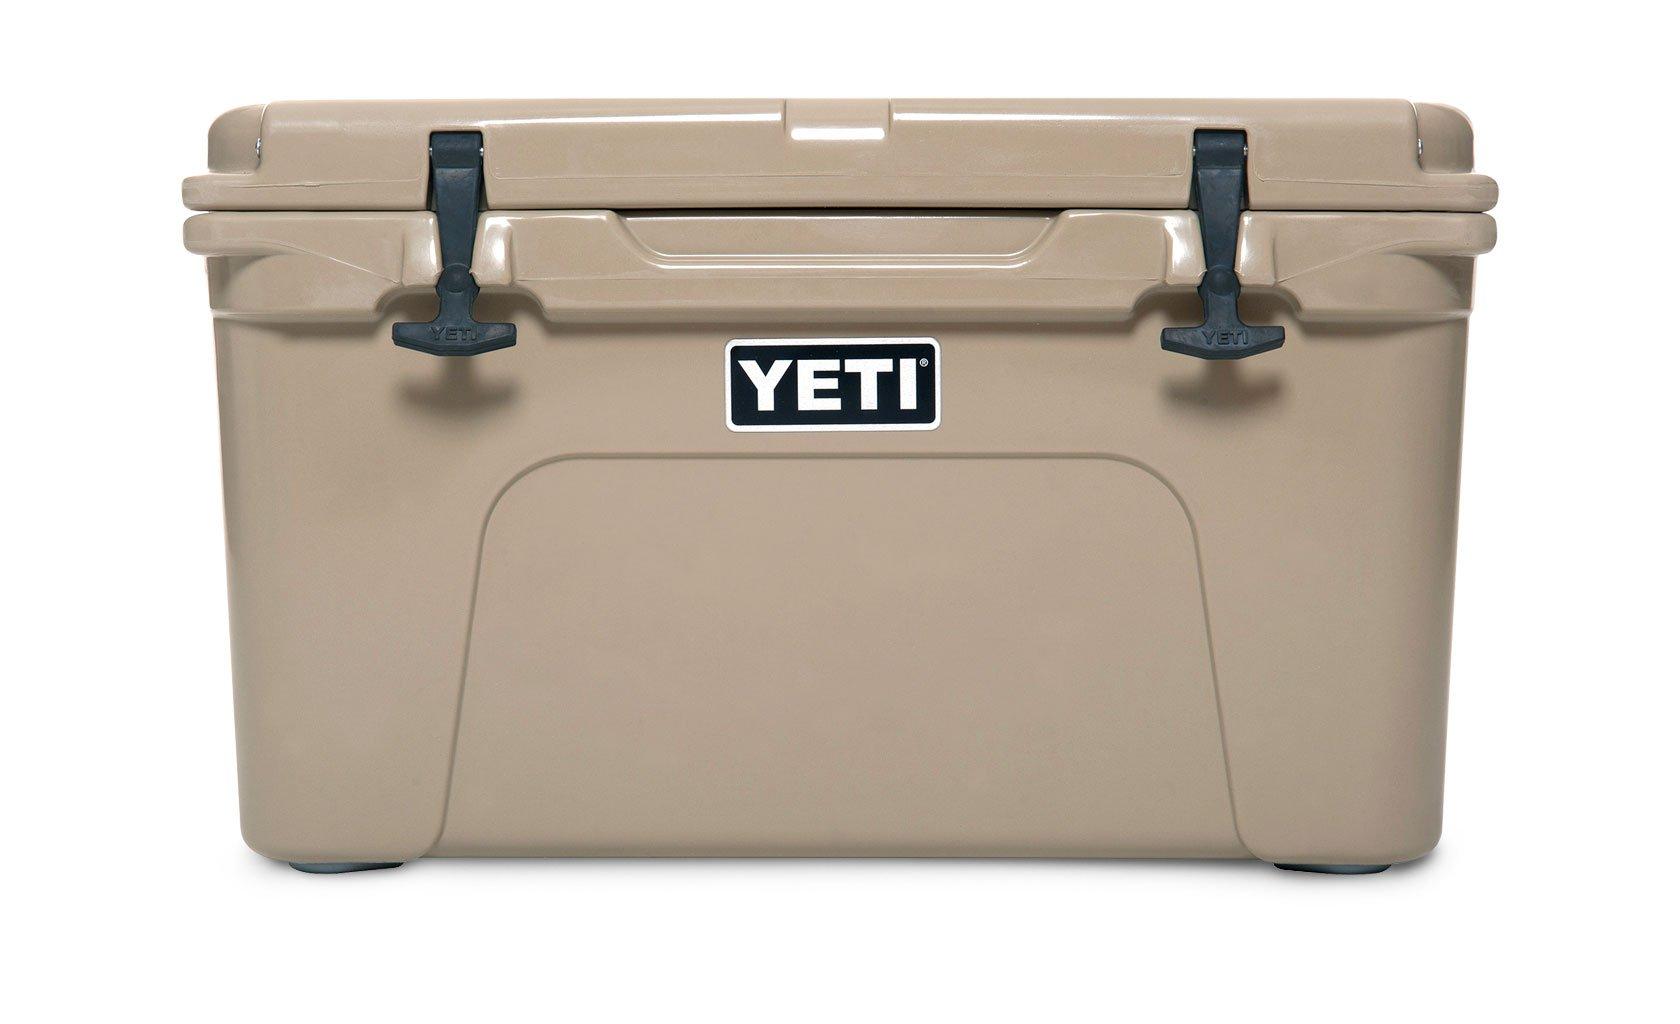 Beige ice cooler labeled Yeti.